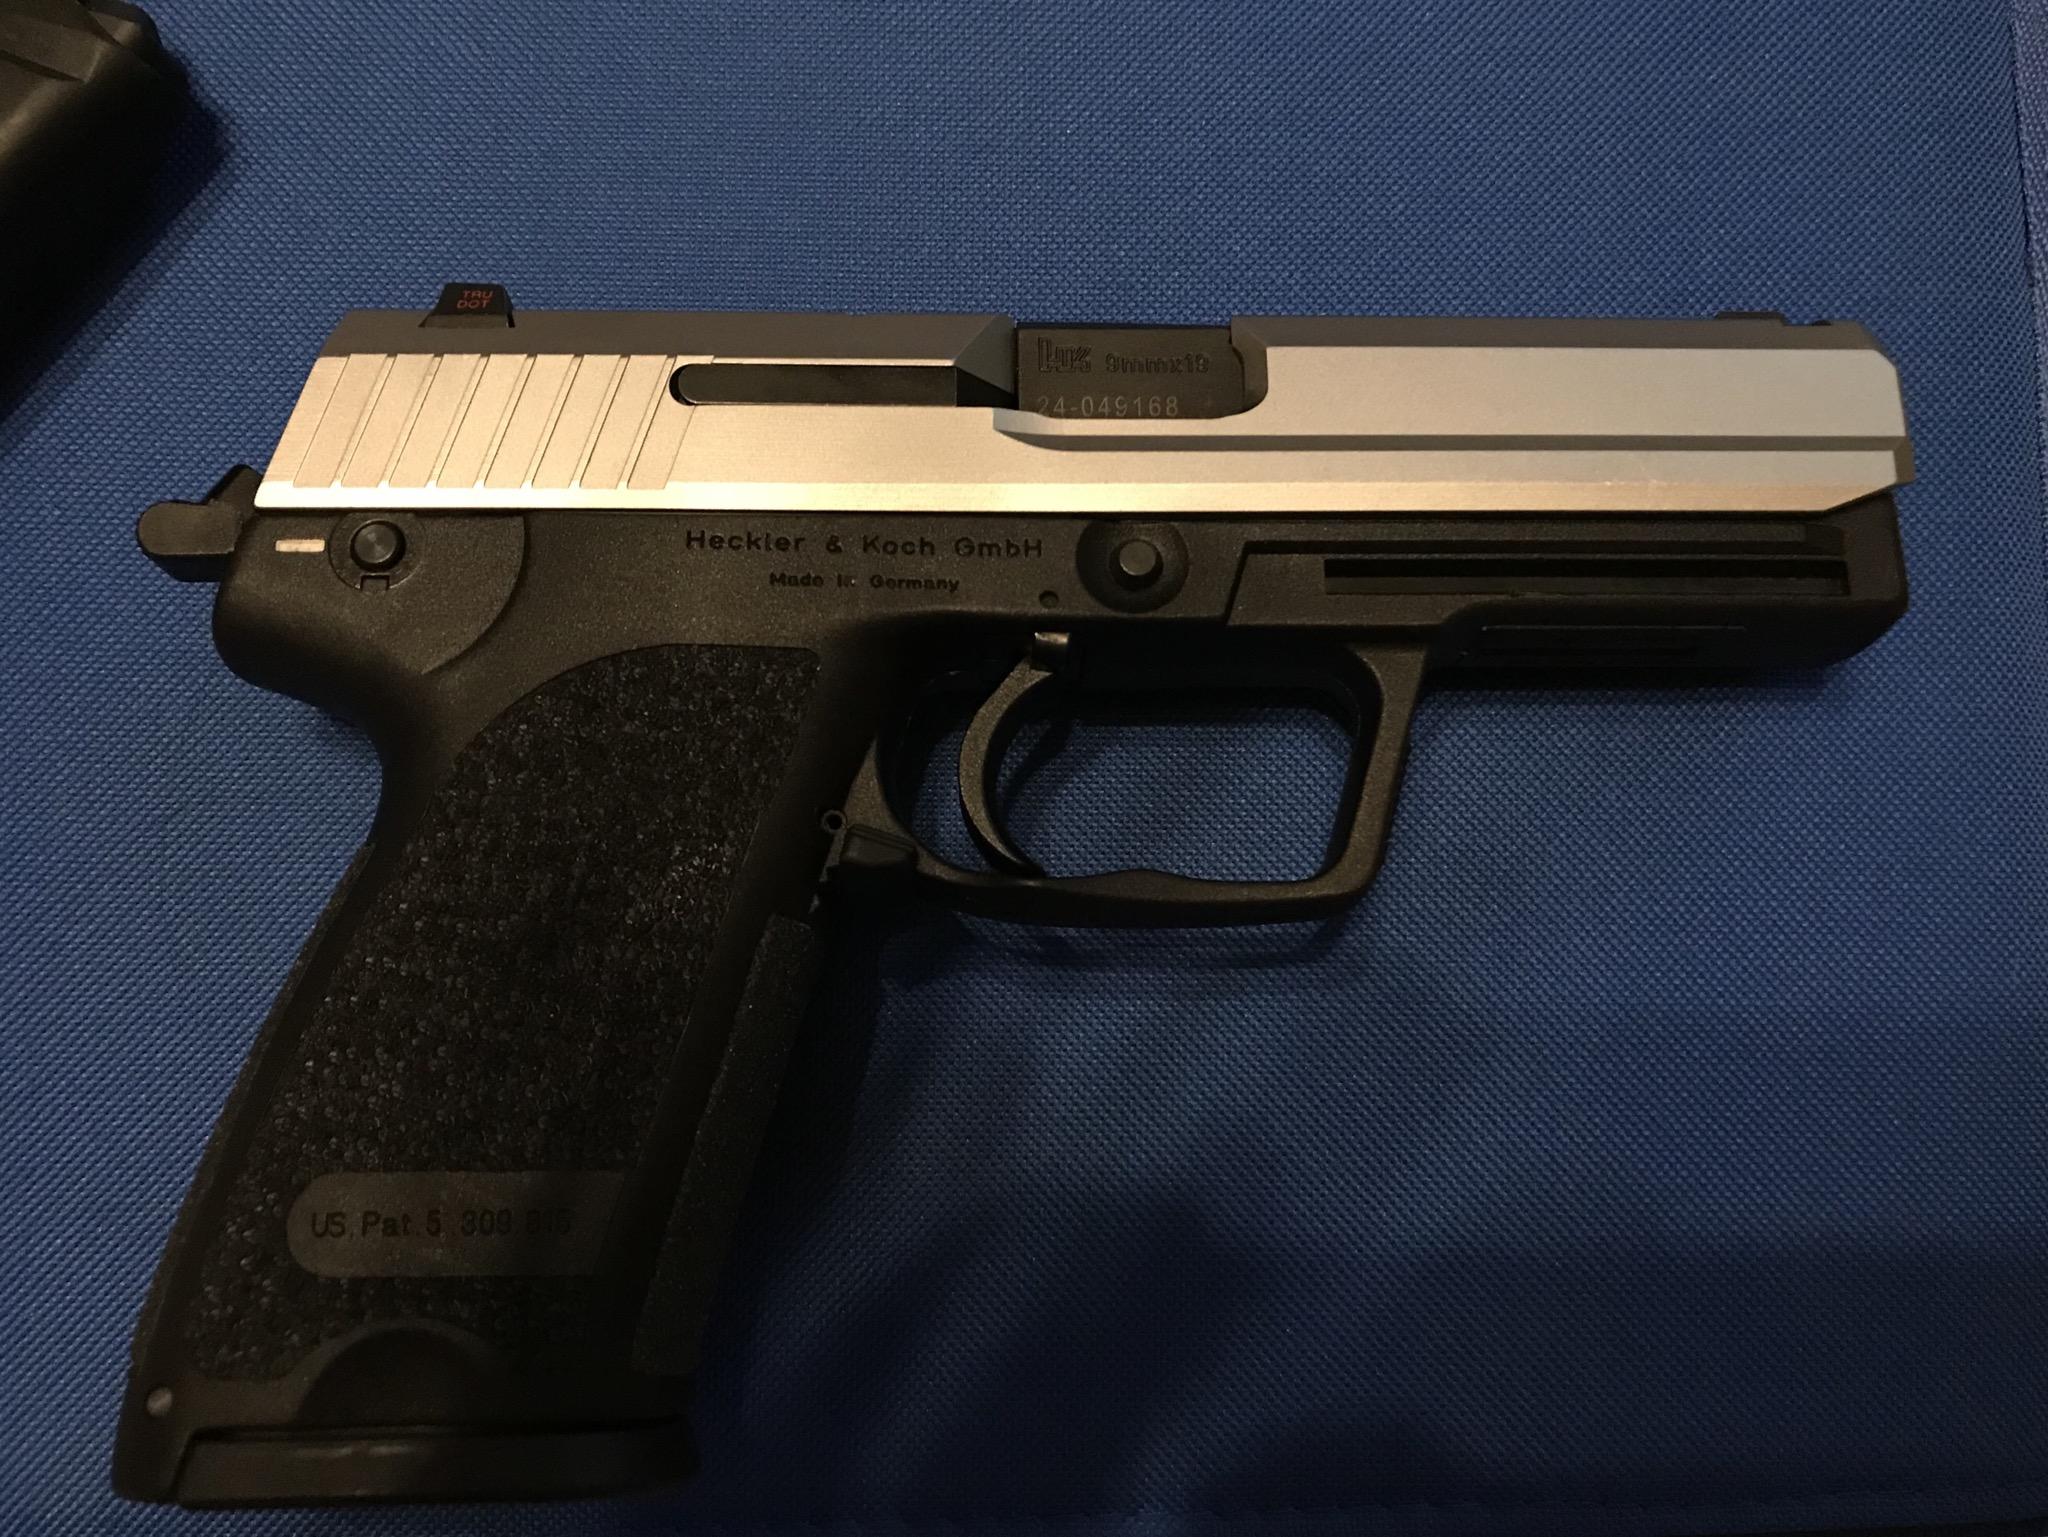 HK USP stainless-656fdc92-9a03-43fe-b832-38bad378ed1c_1523097561901.jpeg